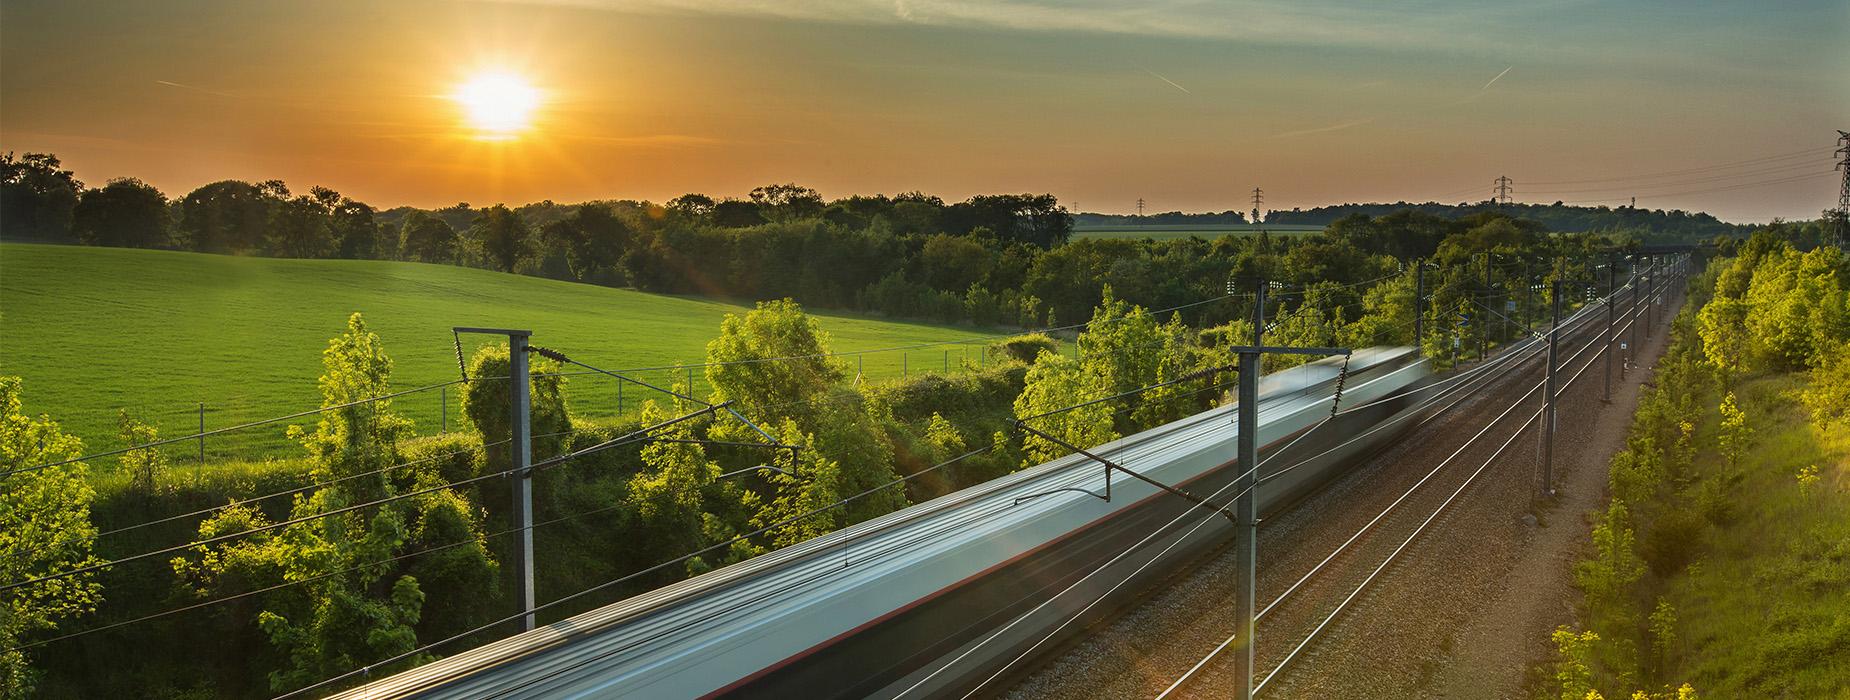 Solar on train lines